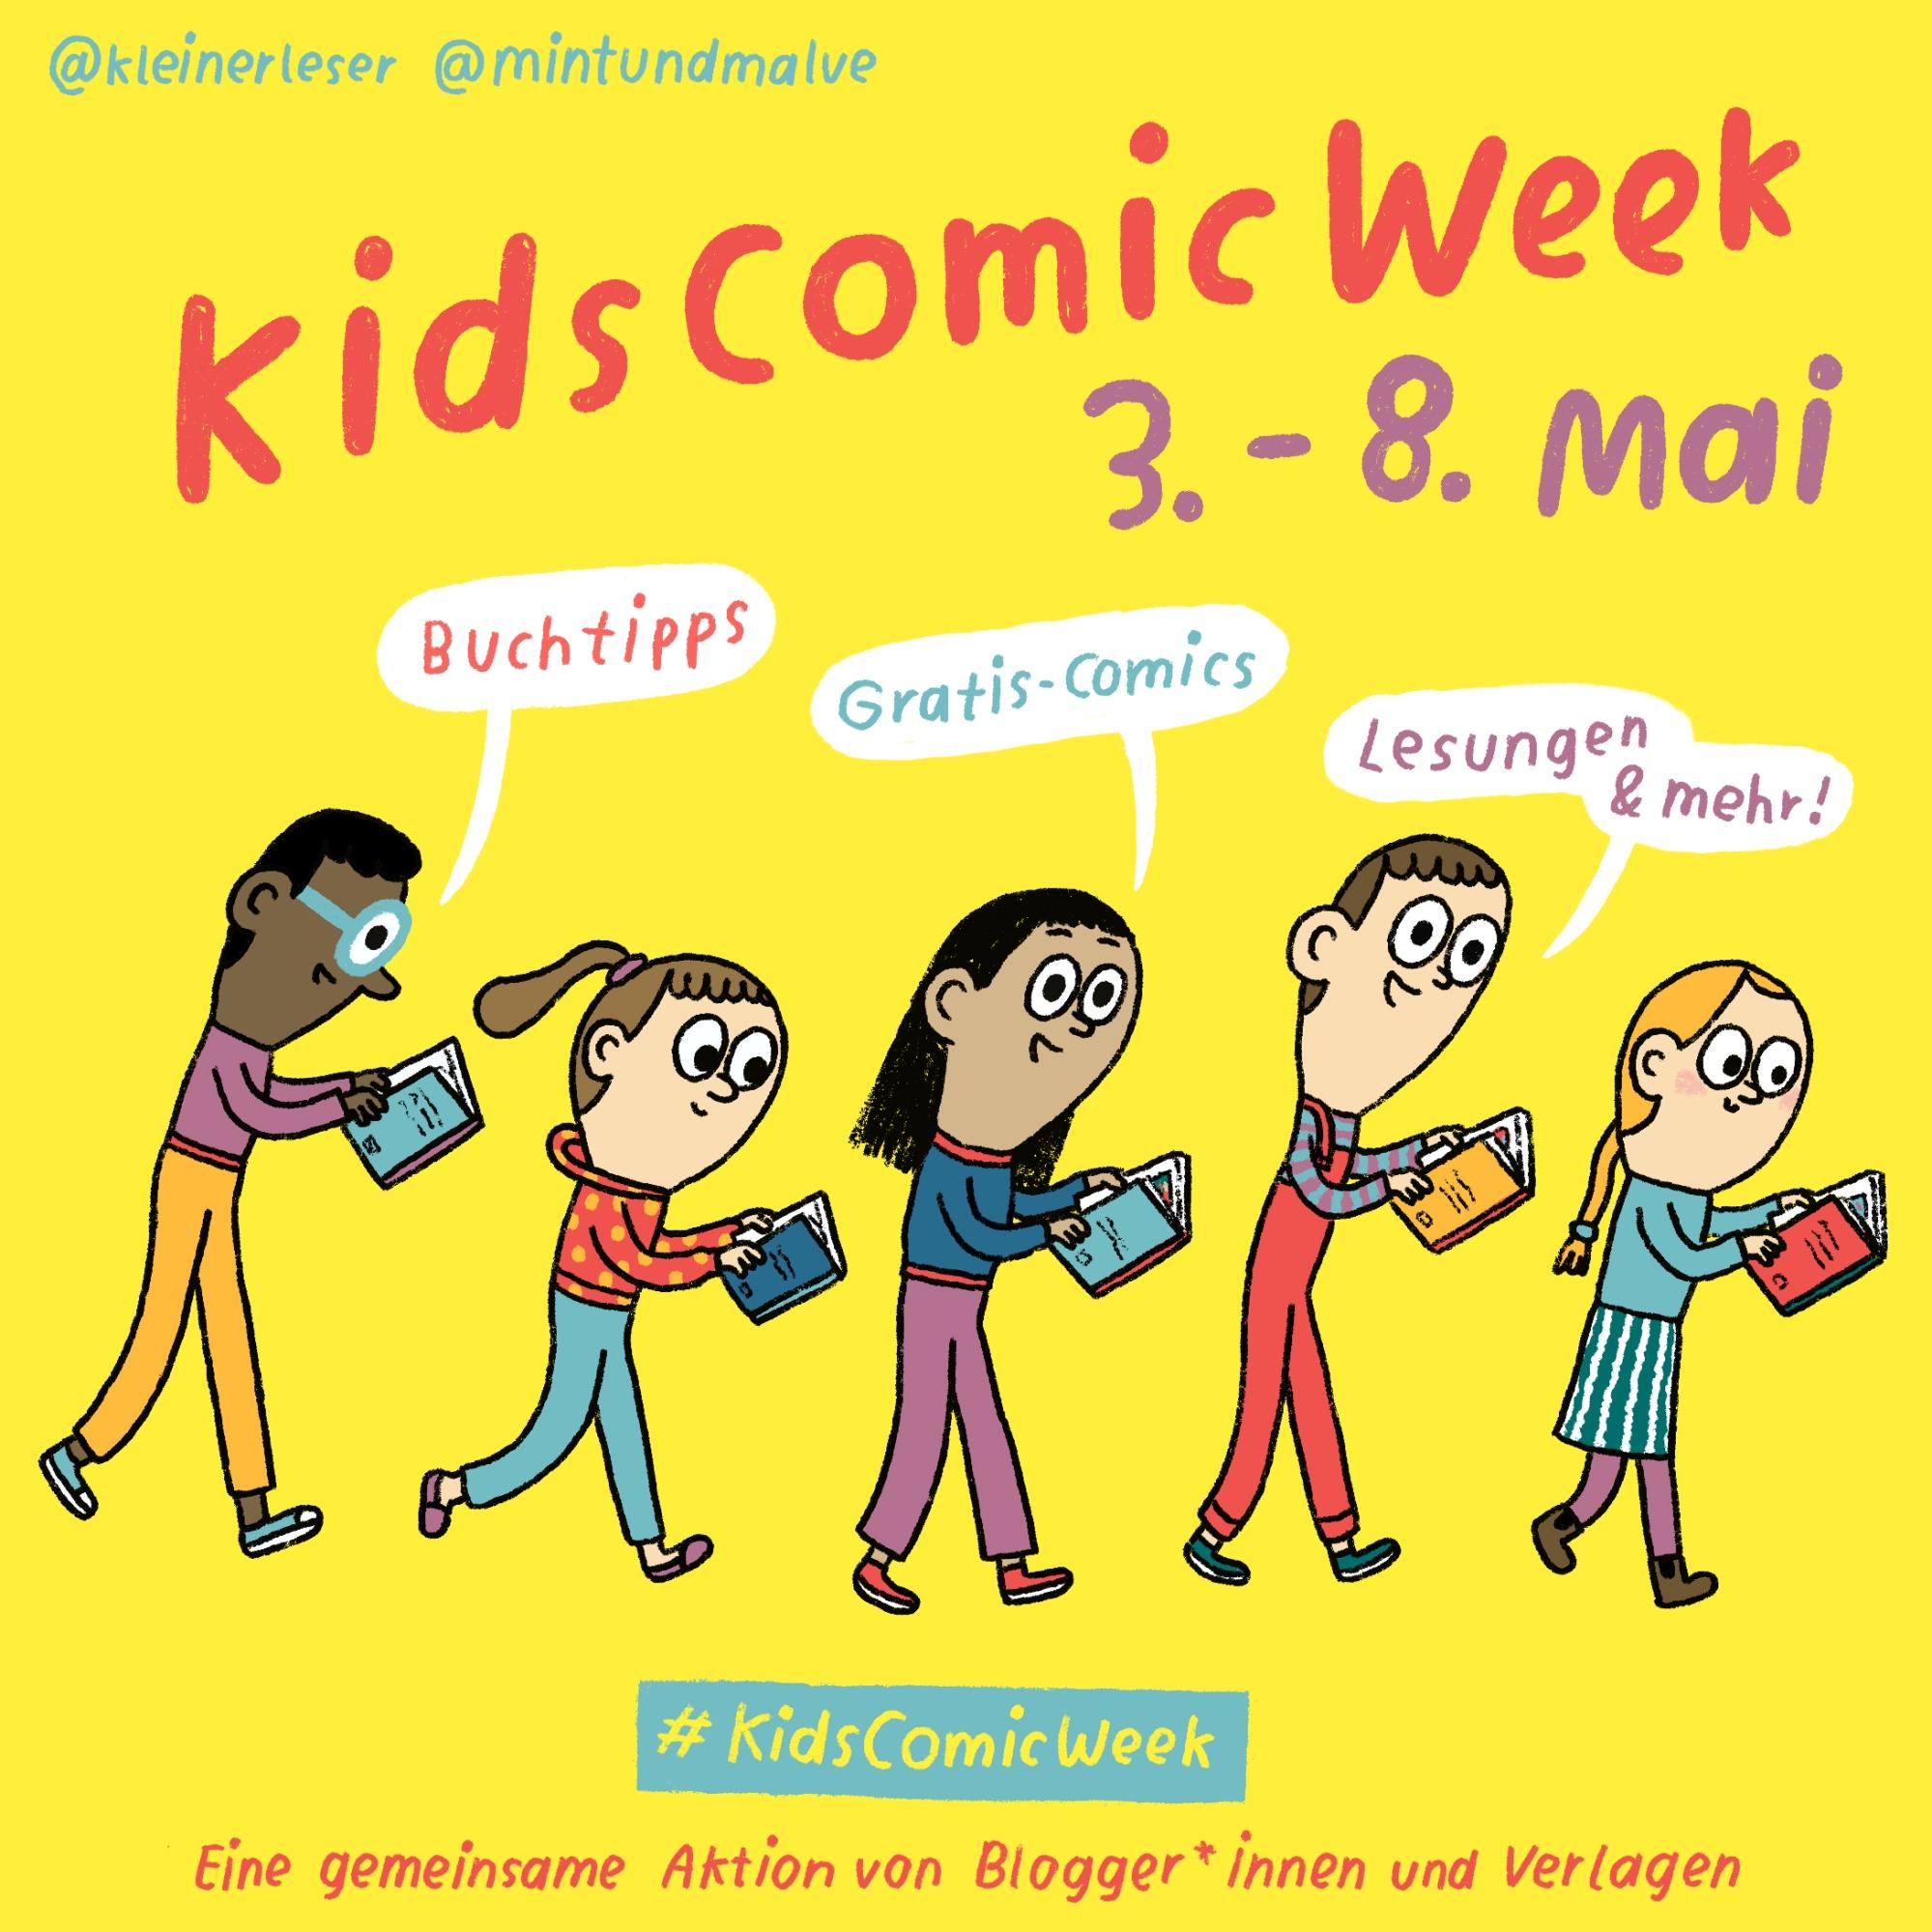 Kids Comic Week: Alles klar, Dracula - Juli liest